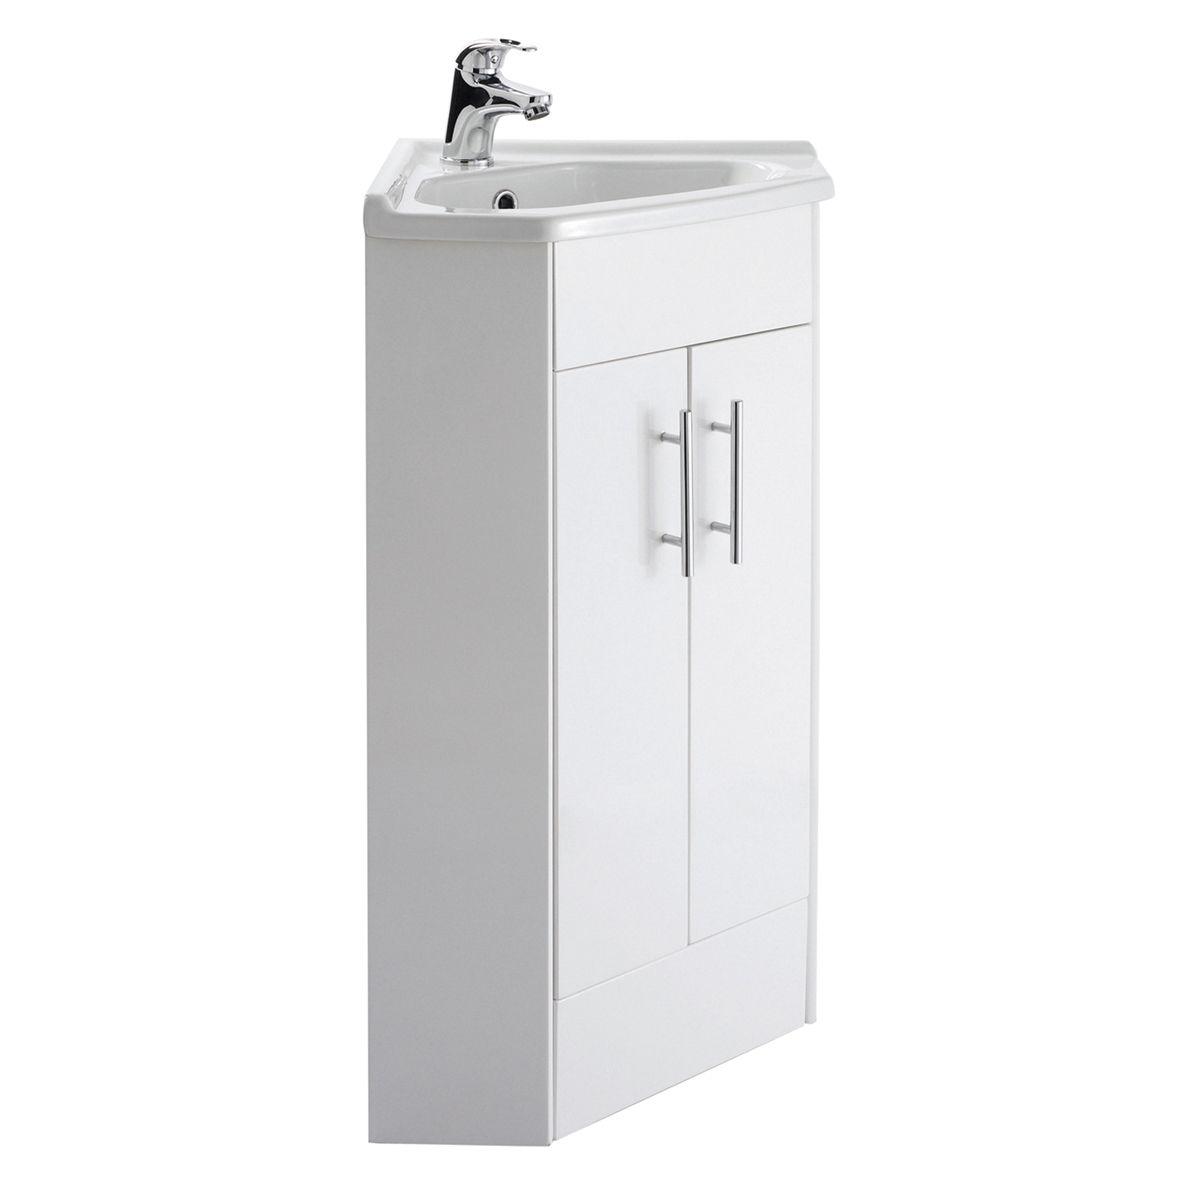 Nuie High Gloss White Corner Vanity Unit